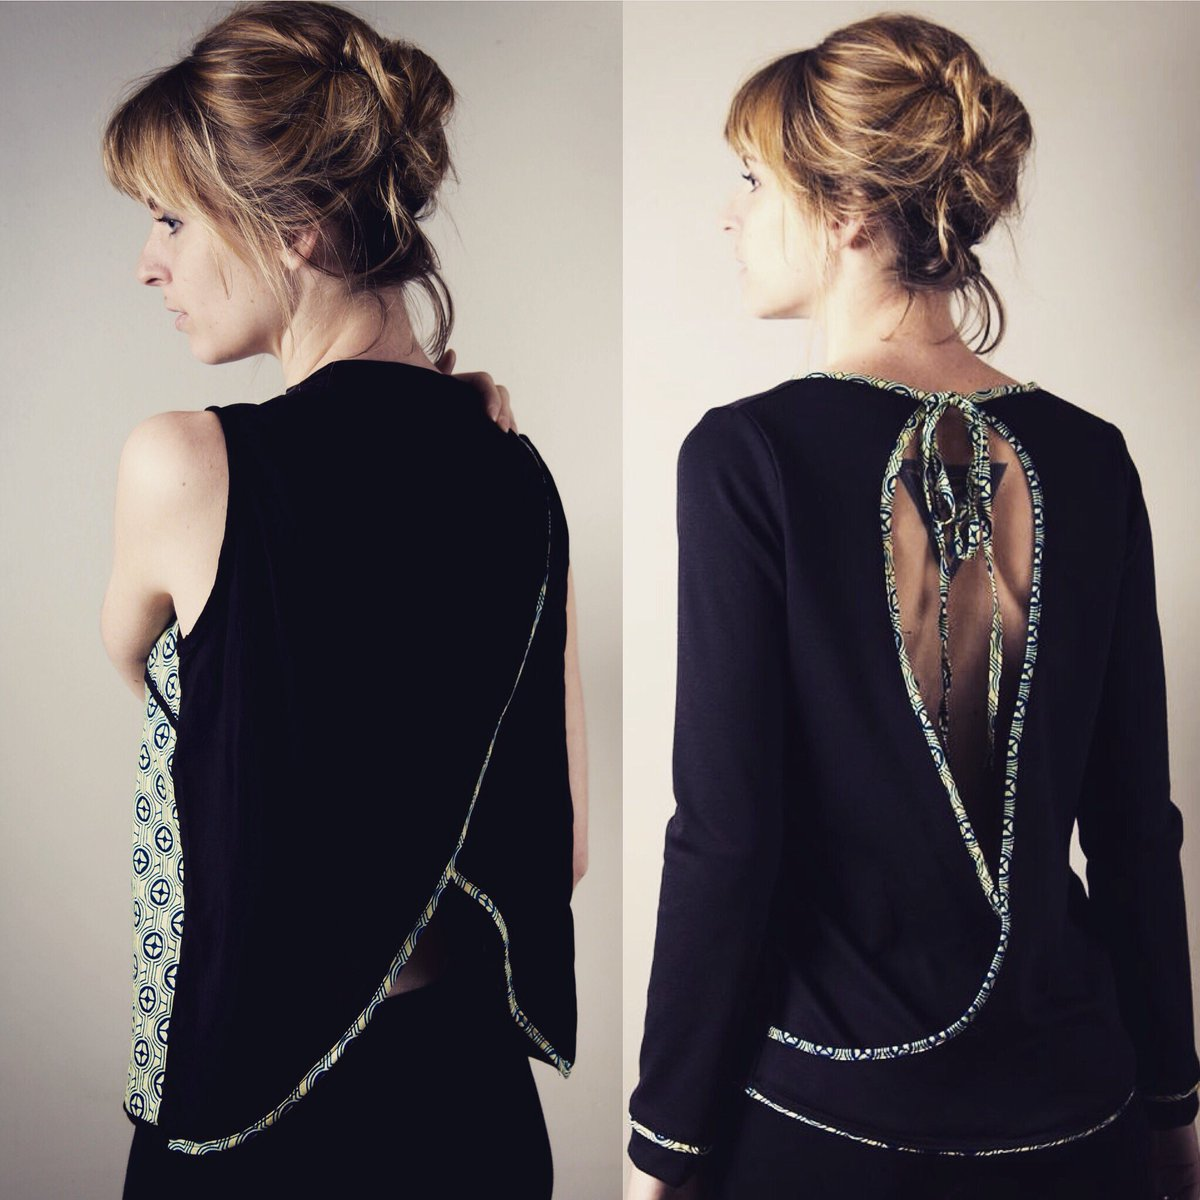 AllBy.K: le #madeinFrance à prix #canon ! :) Adoptez la #green attitude!  http:// allbyk.fr  &nbsp;   #fashion #mode #style #ethnic #top #women<br>http://pic.twitter.com/7jEFDLvile